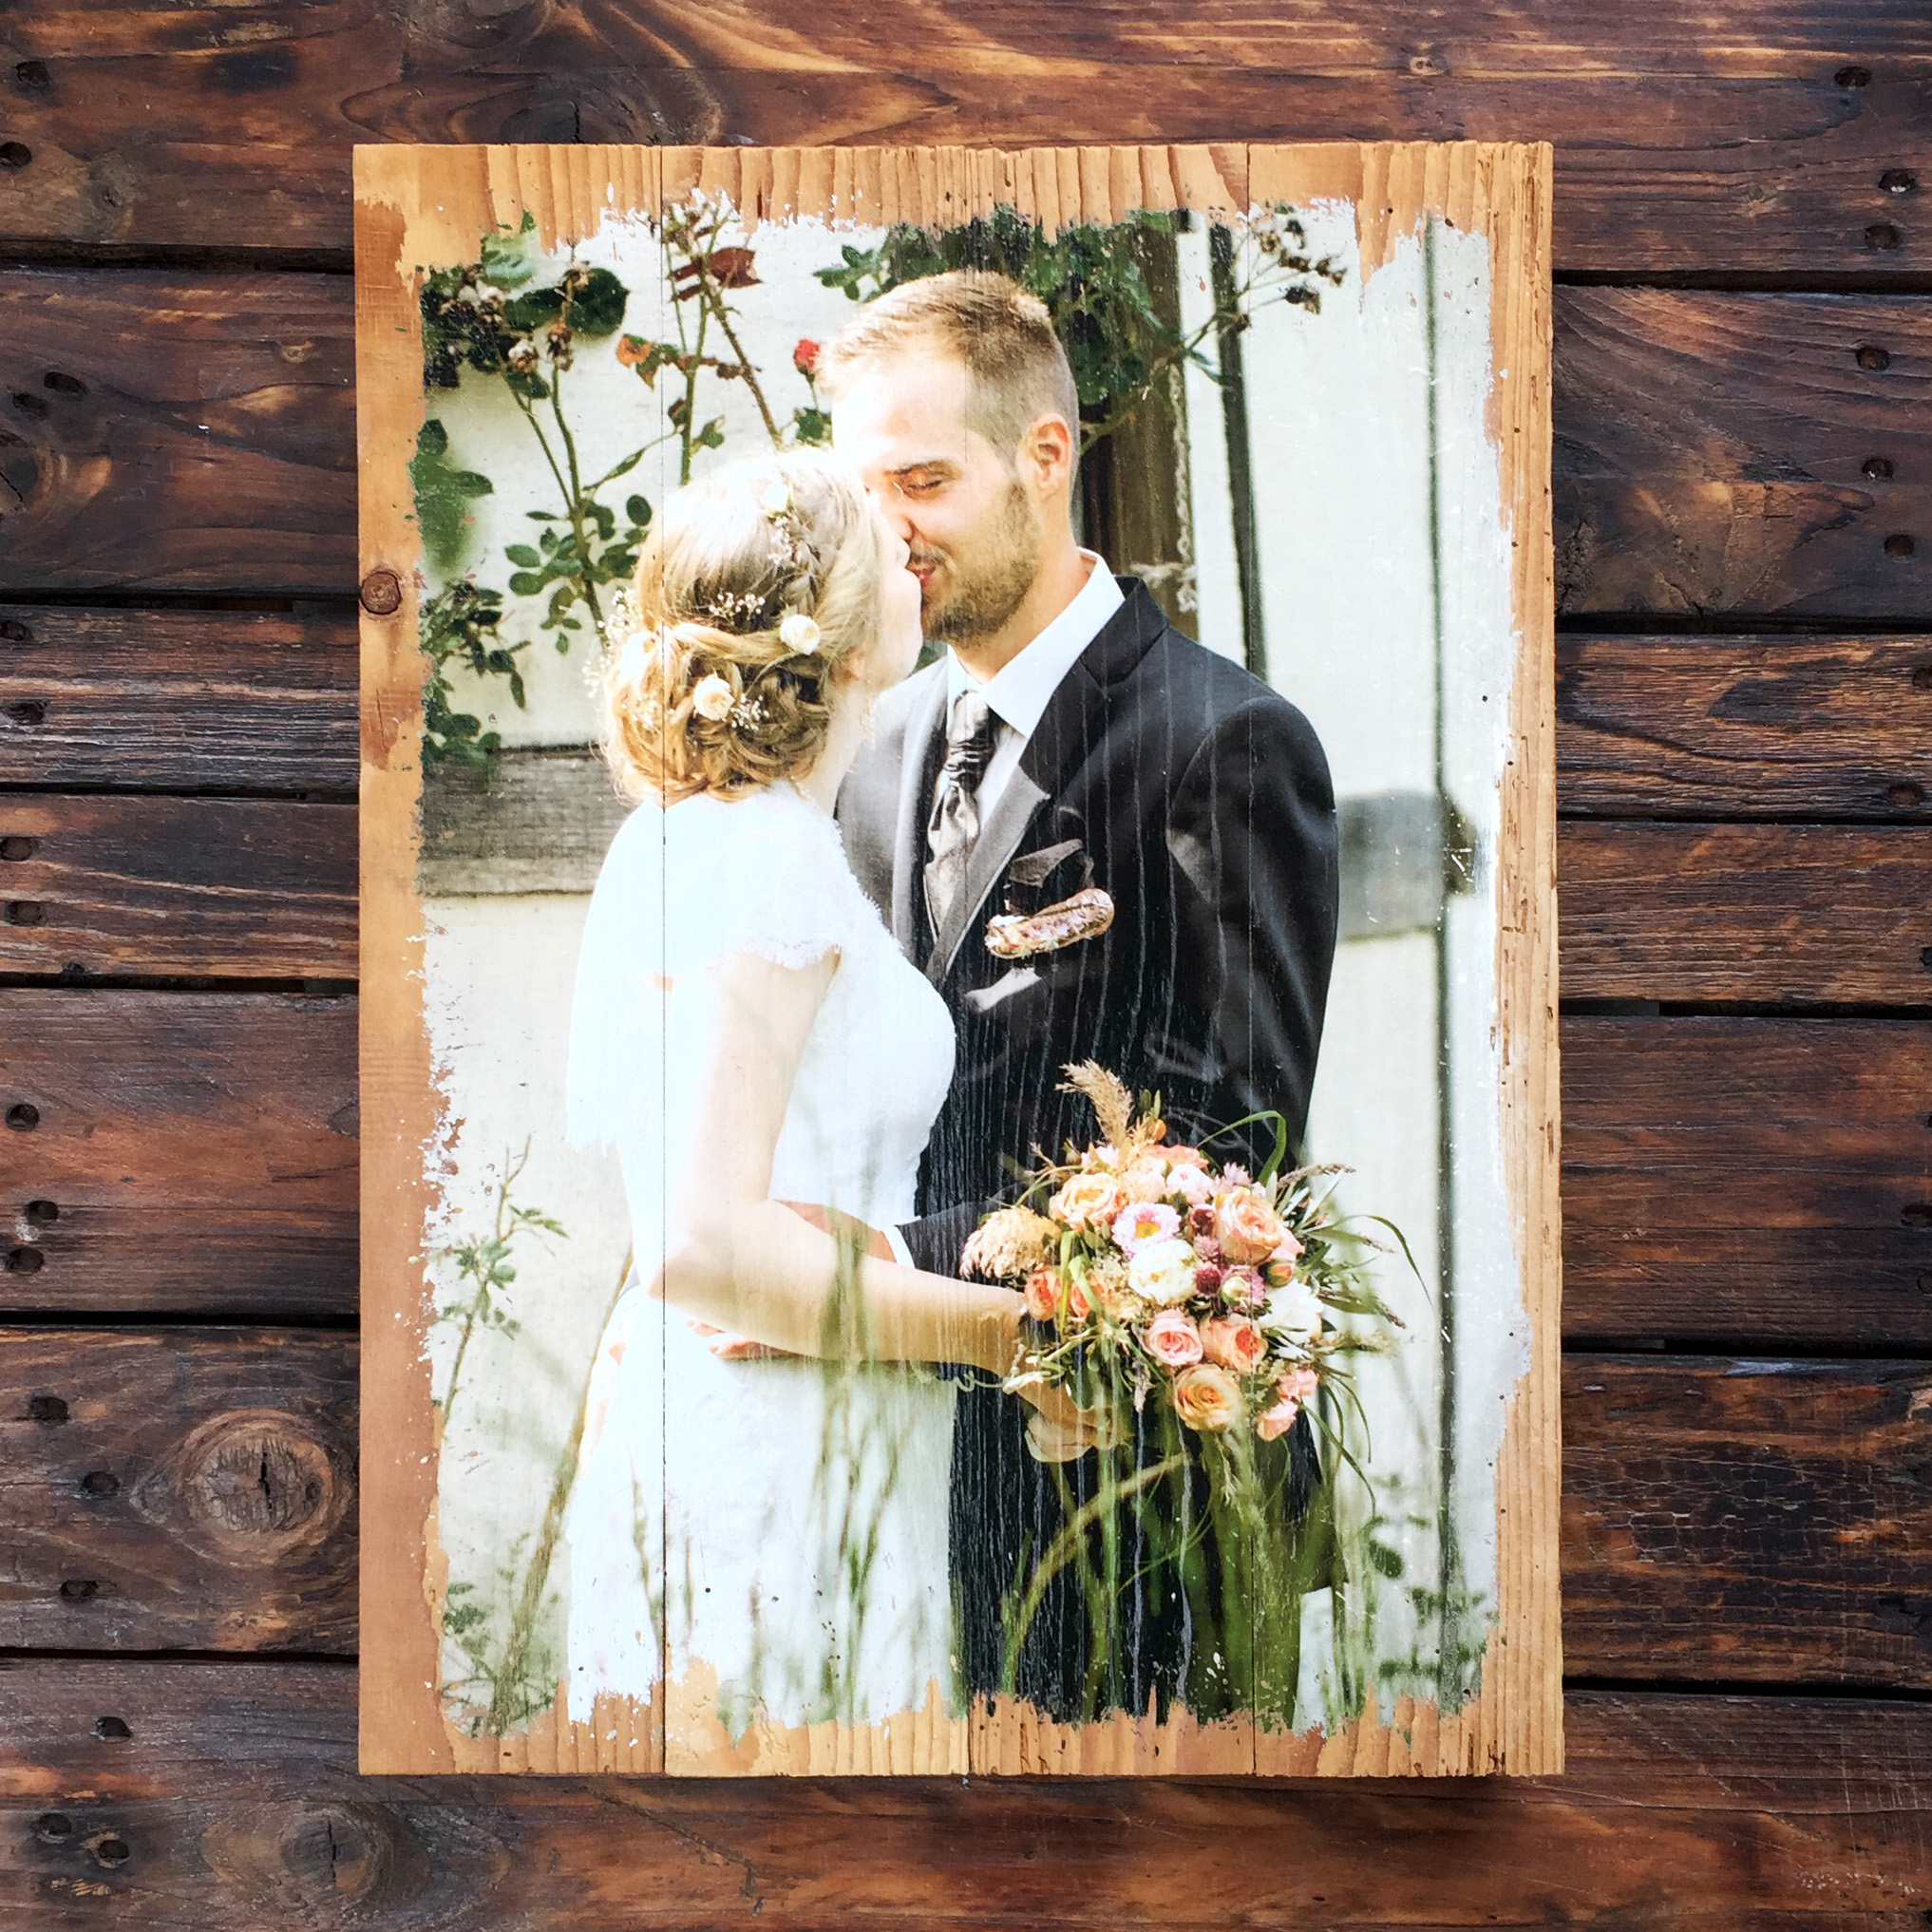 lumberprint foto auf holz bild auf holz holzdruck fotodruck altholz fotogeschenk hochzeit. Black Bedroom Furniture Sets. Home Design Ideas